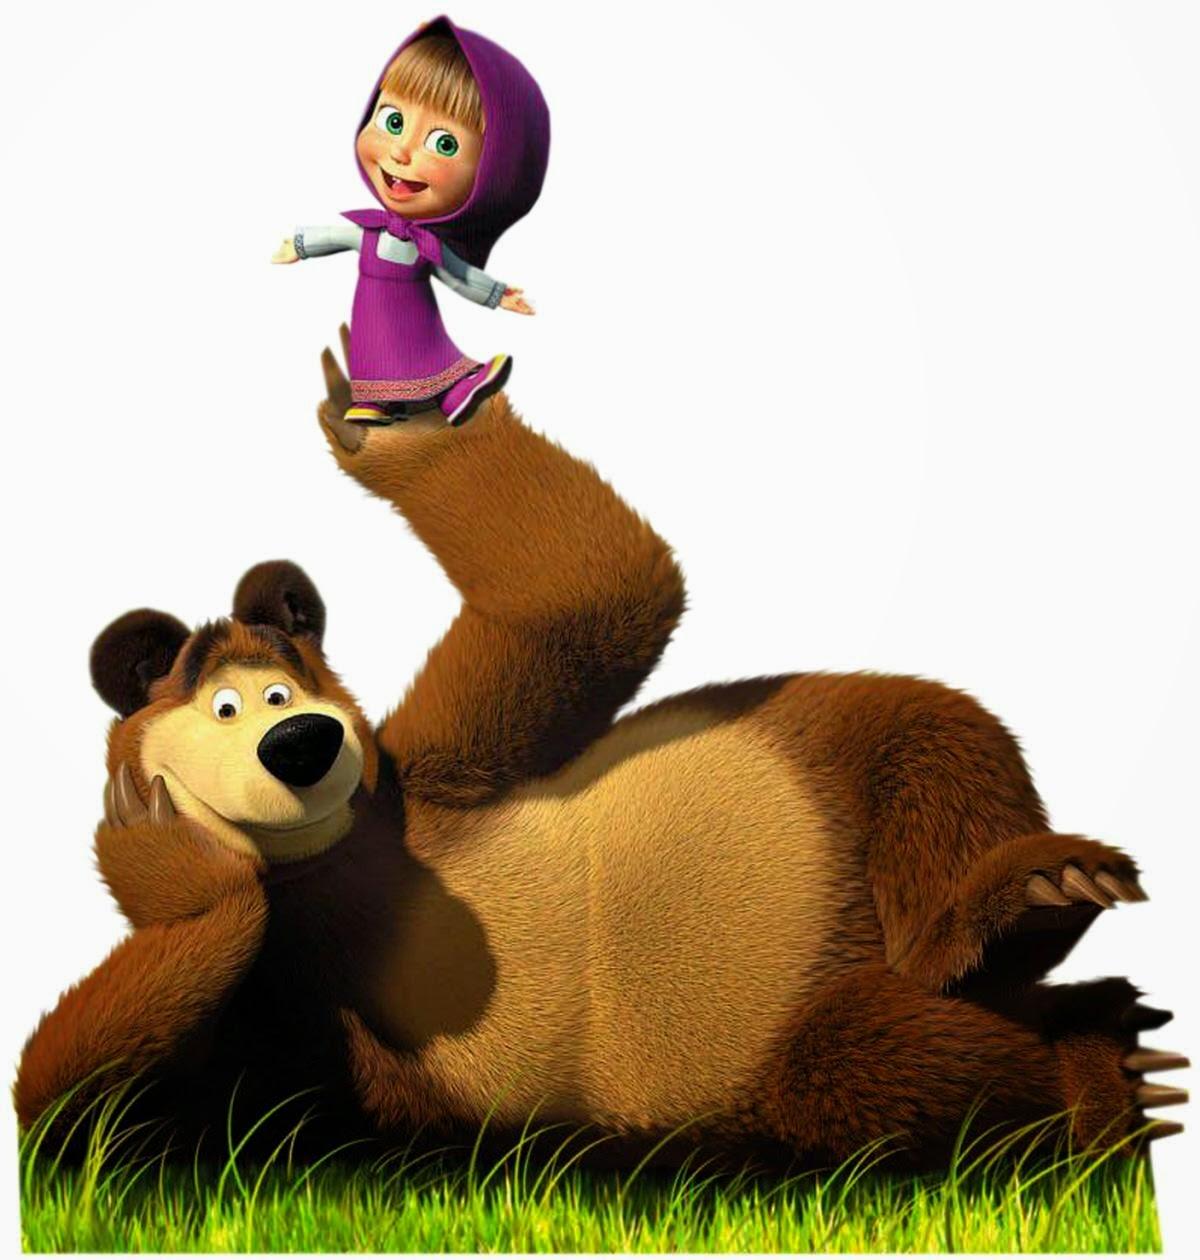 Gambar Wallpaper Boneka Beruang Lucu Terbaru Si Gambar Gambartopcom